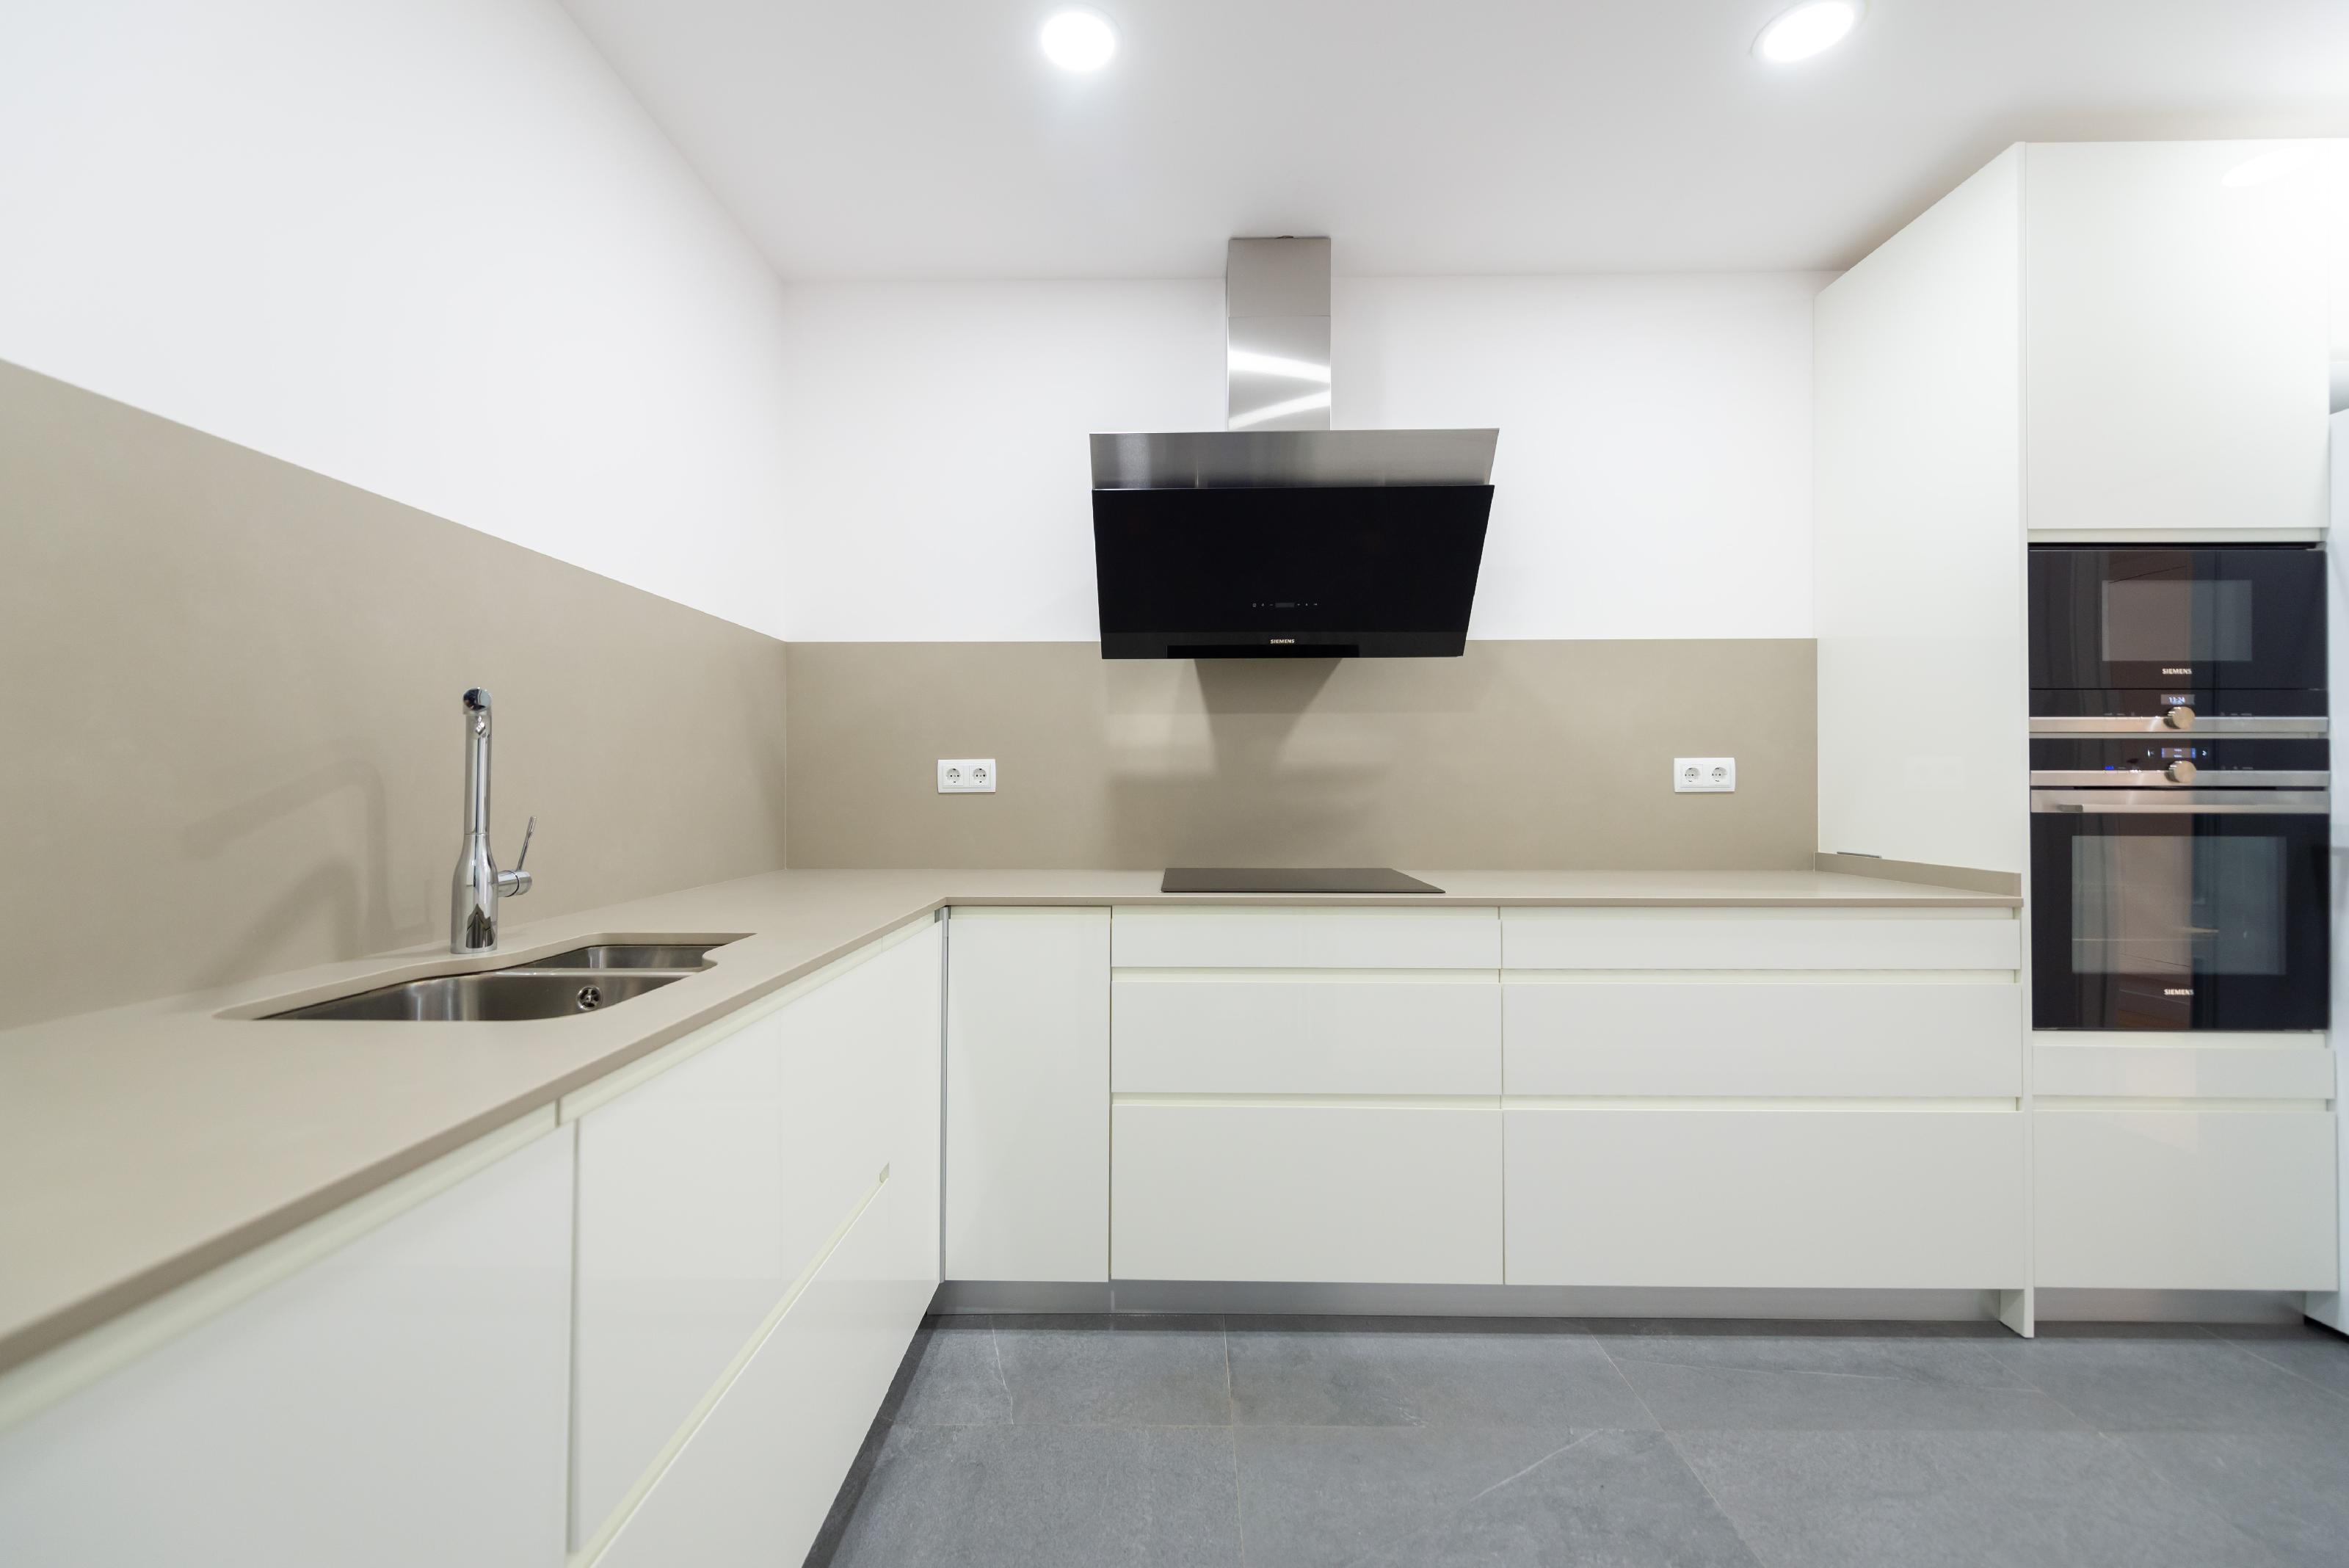 245231 Flat for sale in Sarrià-Sant Gervasi, Sant Gervasi-Galvany 5